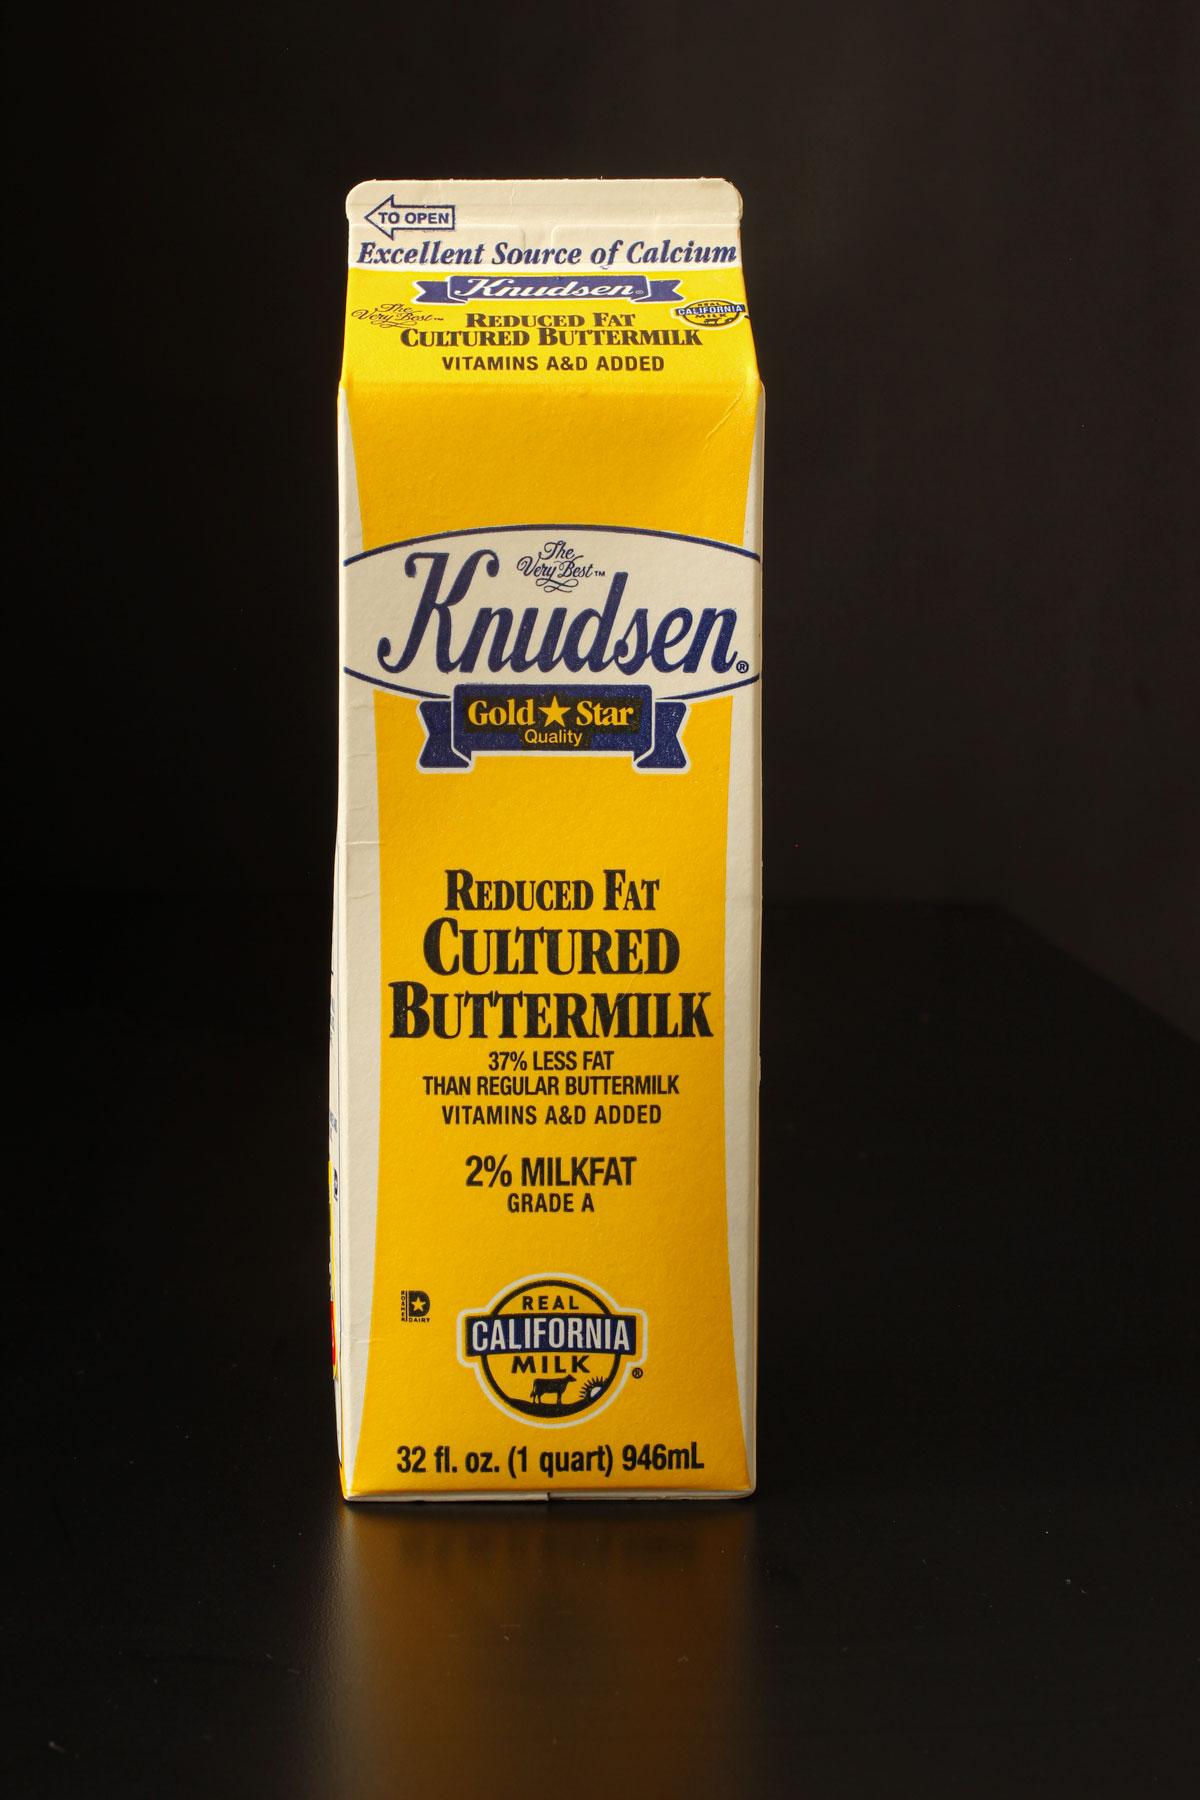 yellow quart carton of Knudsen buttermilk in front of black background.